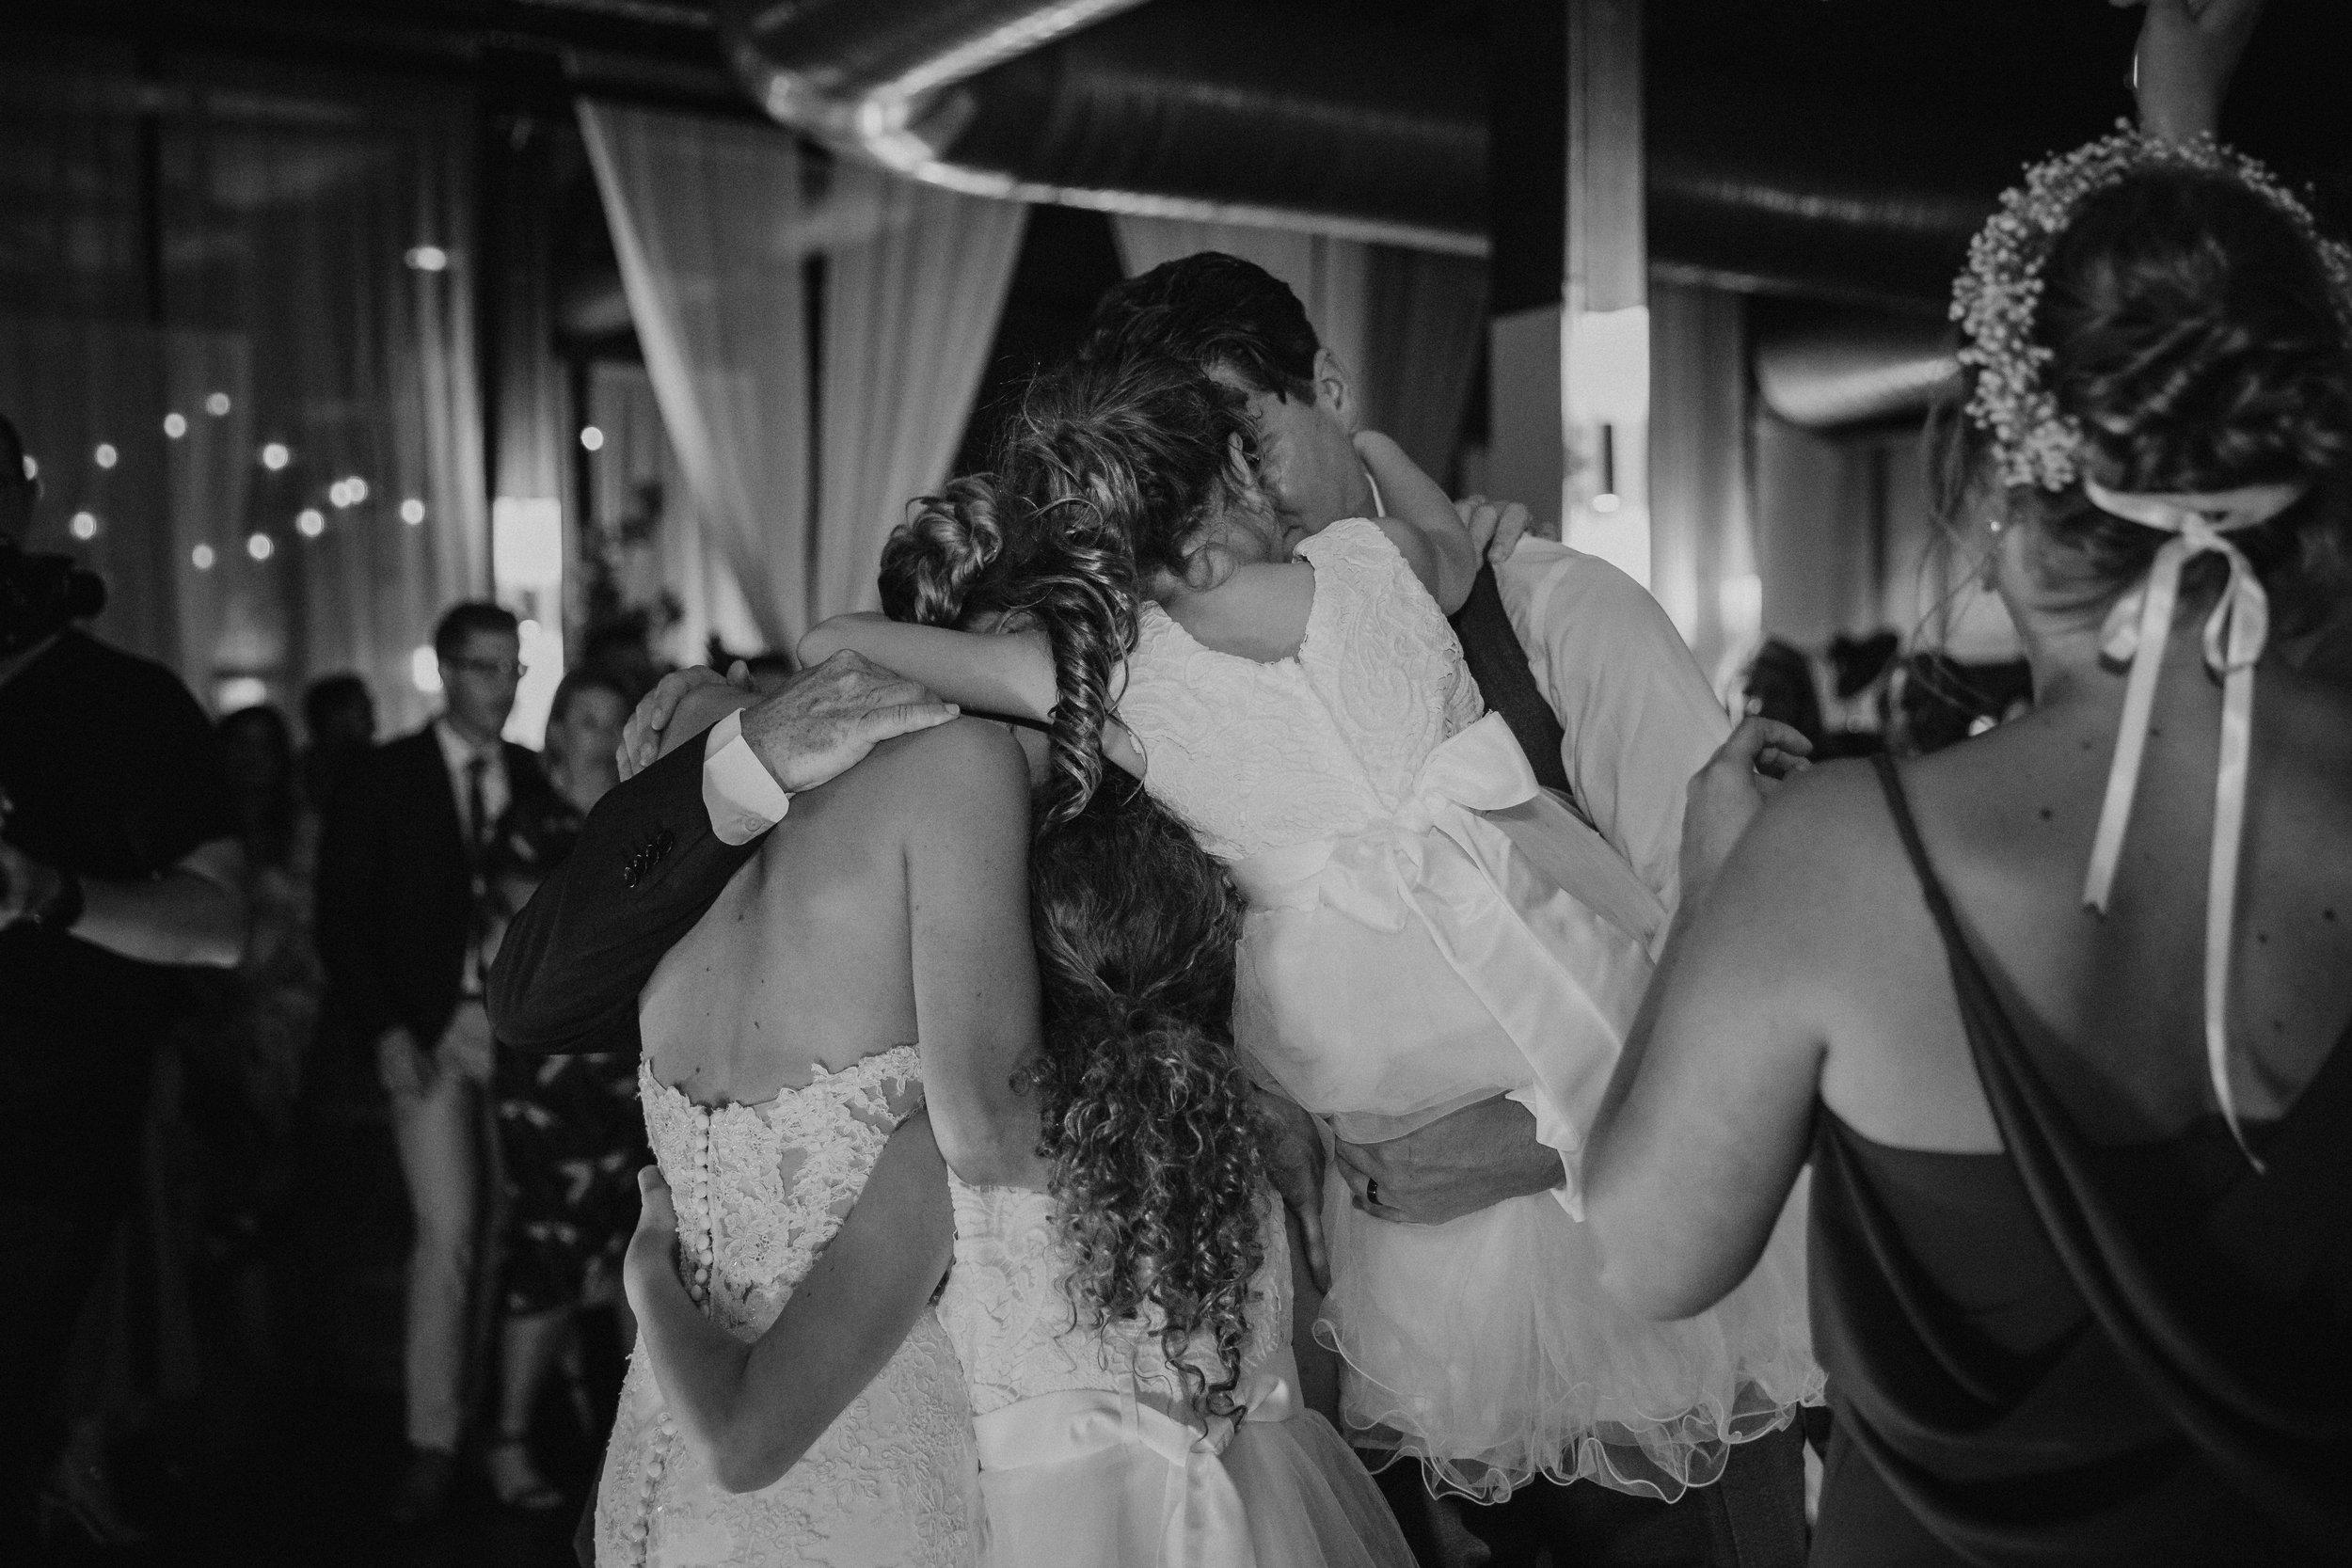 lightspace-brisbane-wedding-052.JPG